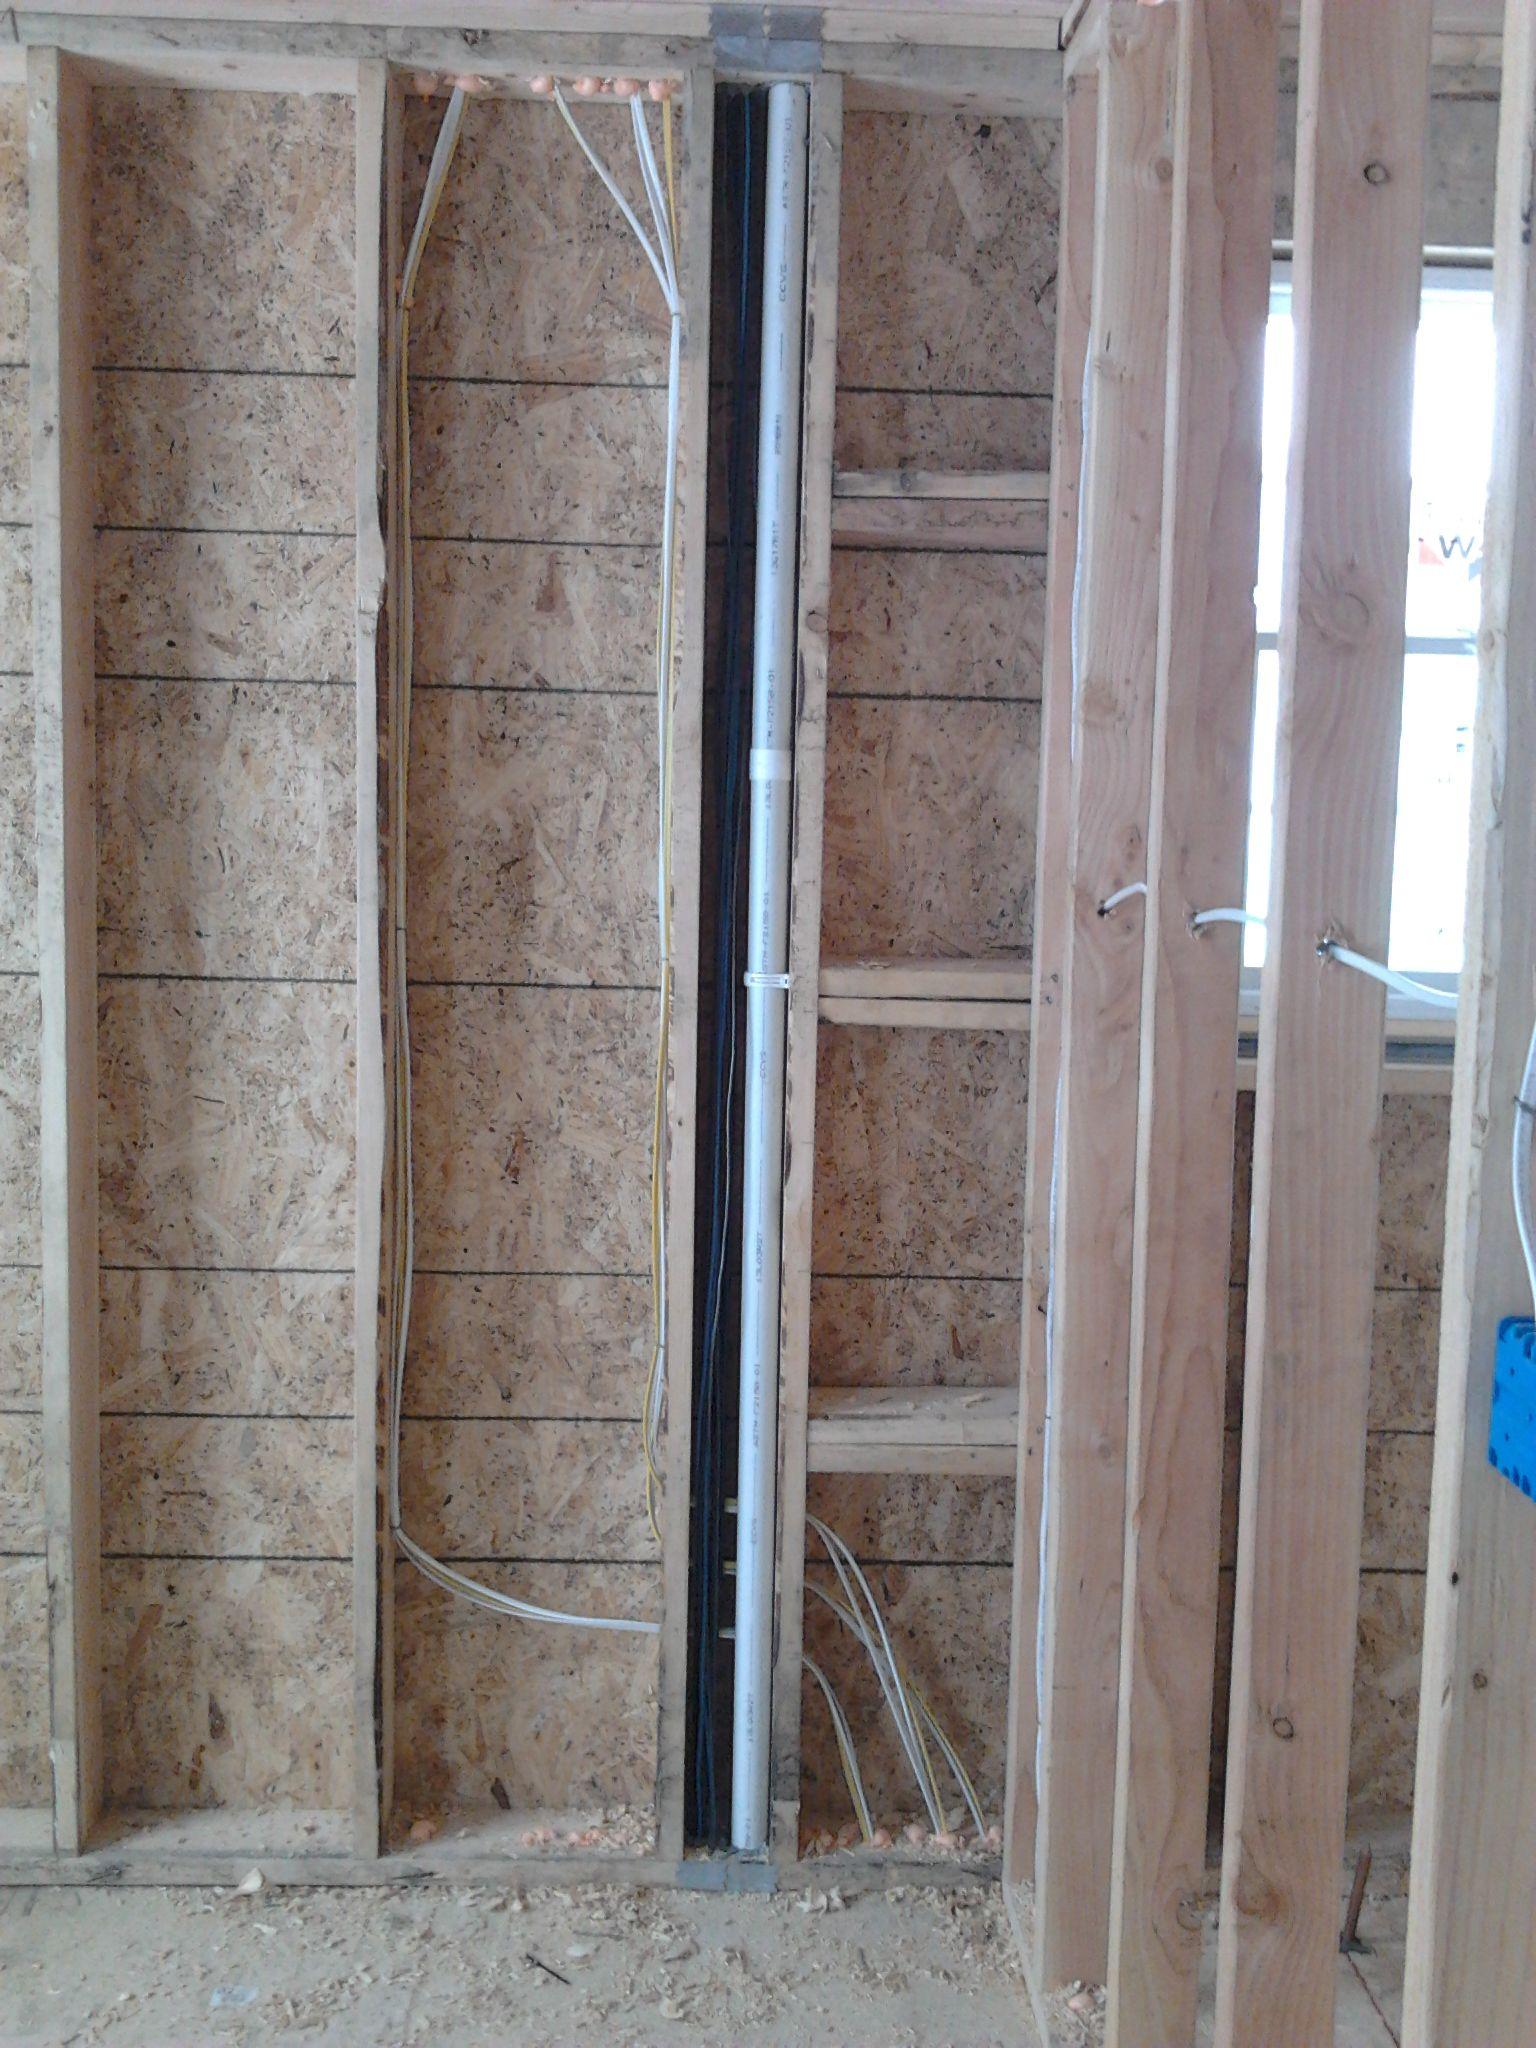 Home Pre Wire Alarm Audio Video Data Garage Doors And Conduit From Attic To Basement For Future Cables Burglar Burglar Alarm Tv Wall Installation